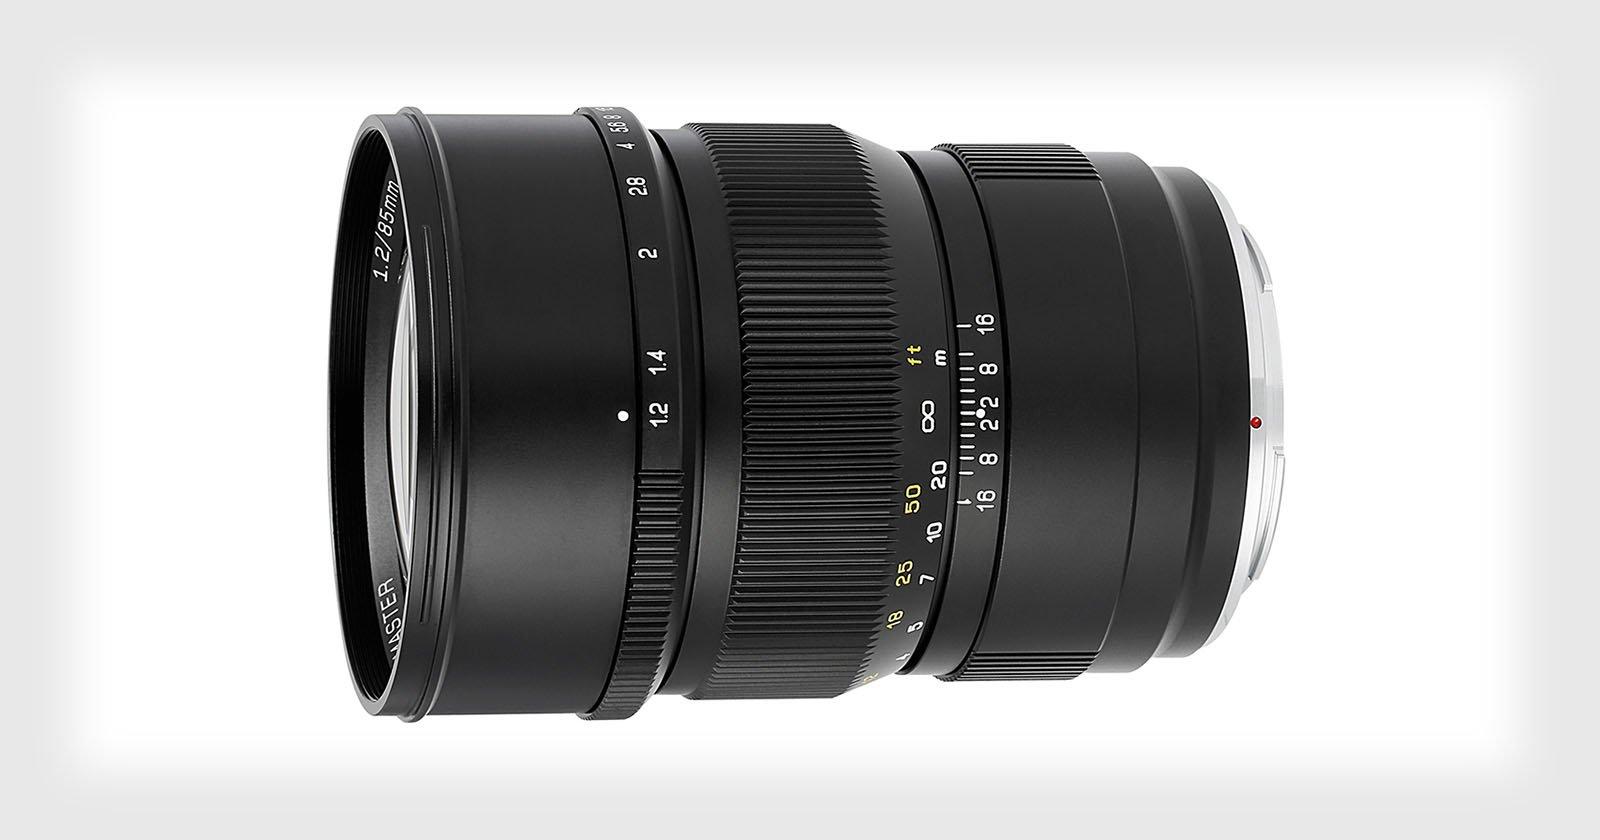 Mitakon Speedmaster 85mm f/1.2 for Canon RF and Nikon Z Costs $680